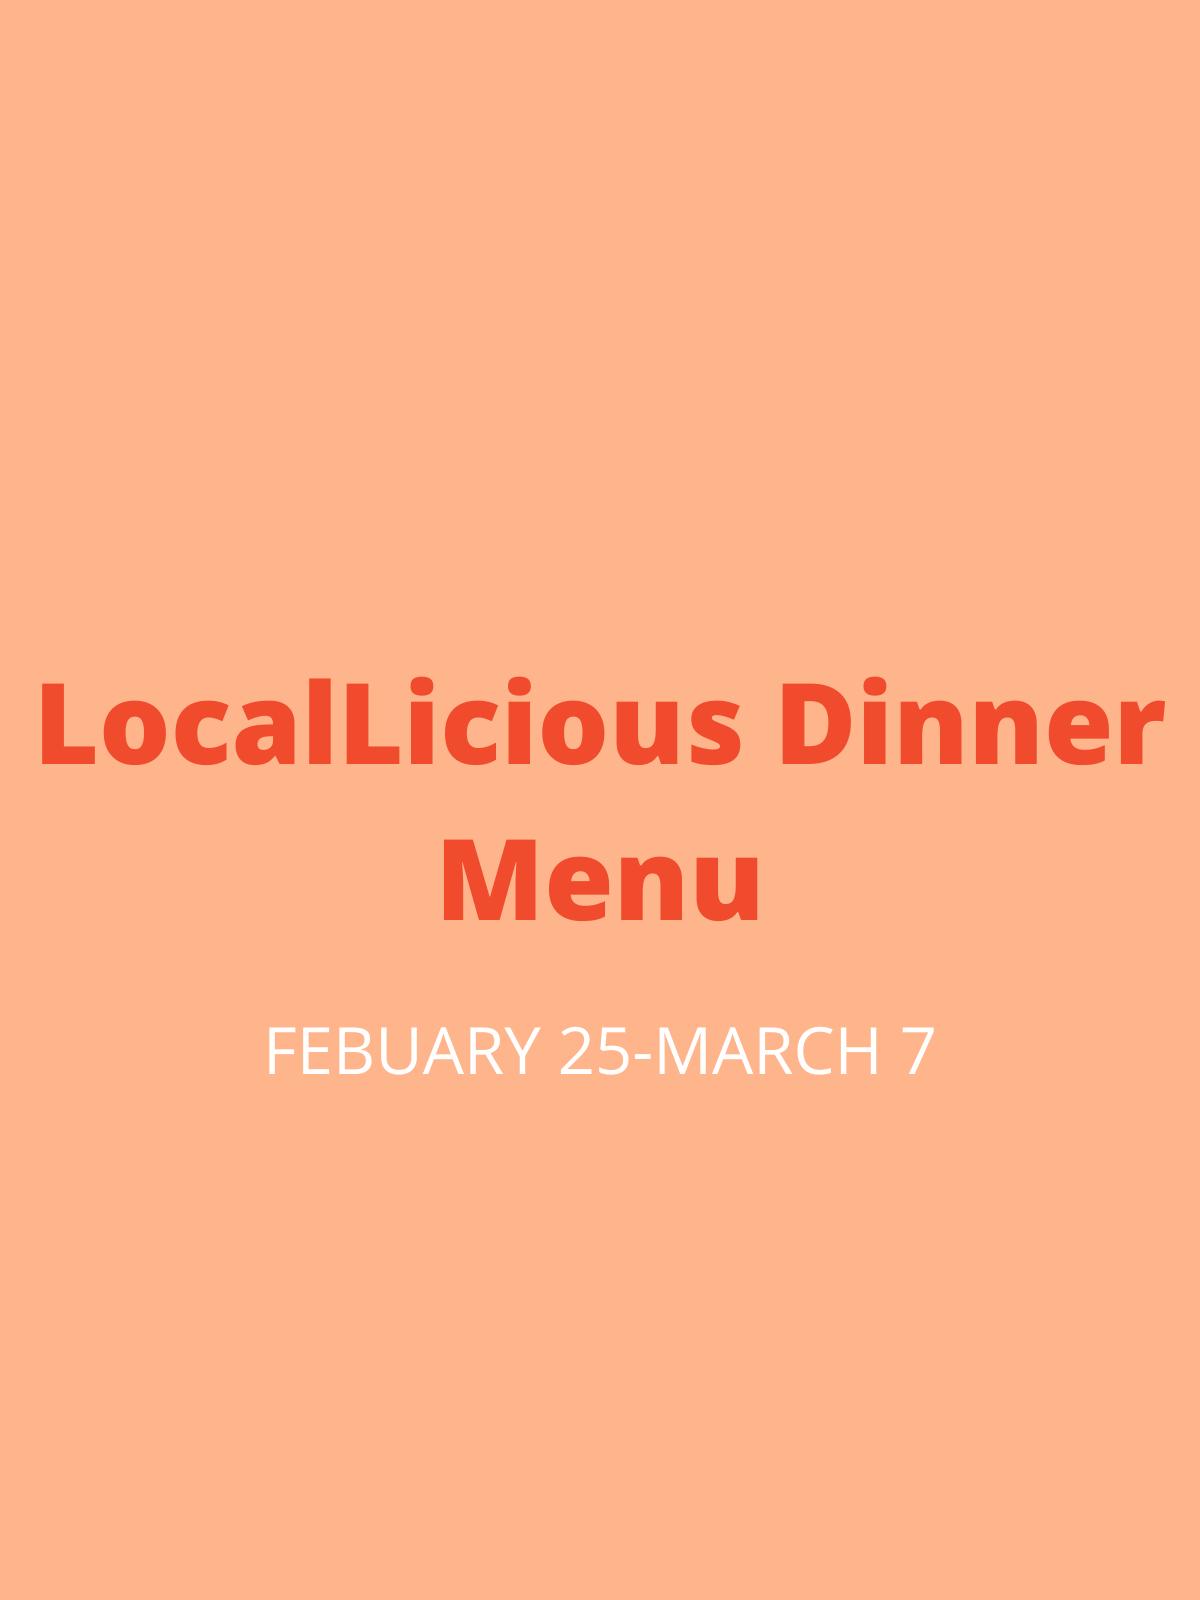 LOCALLICIOUS DINNER MENU